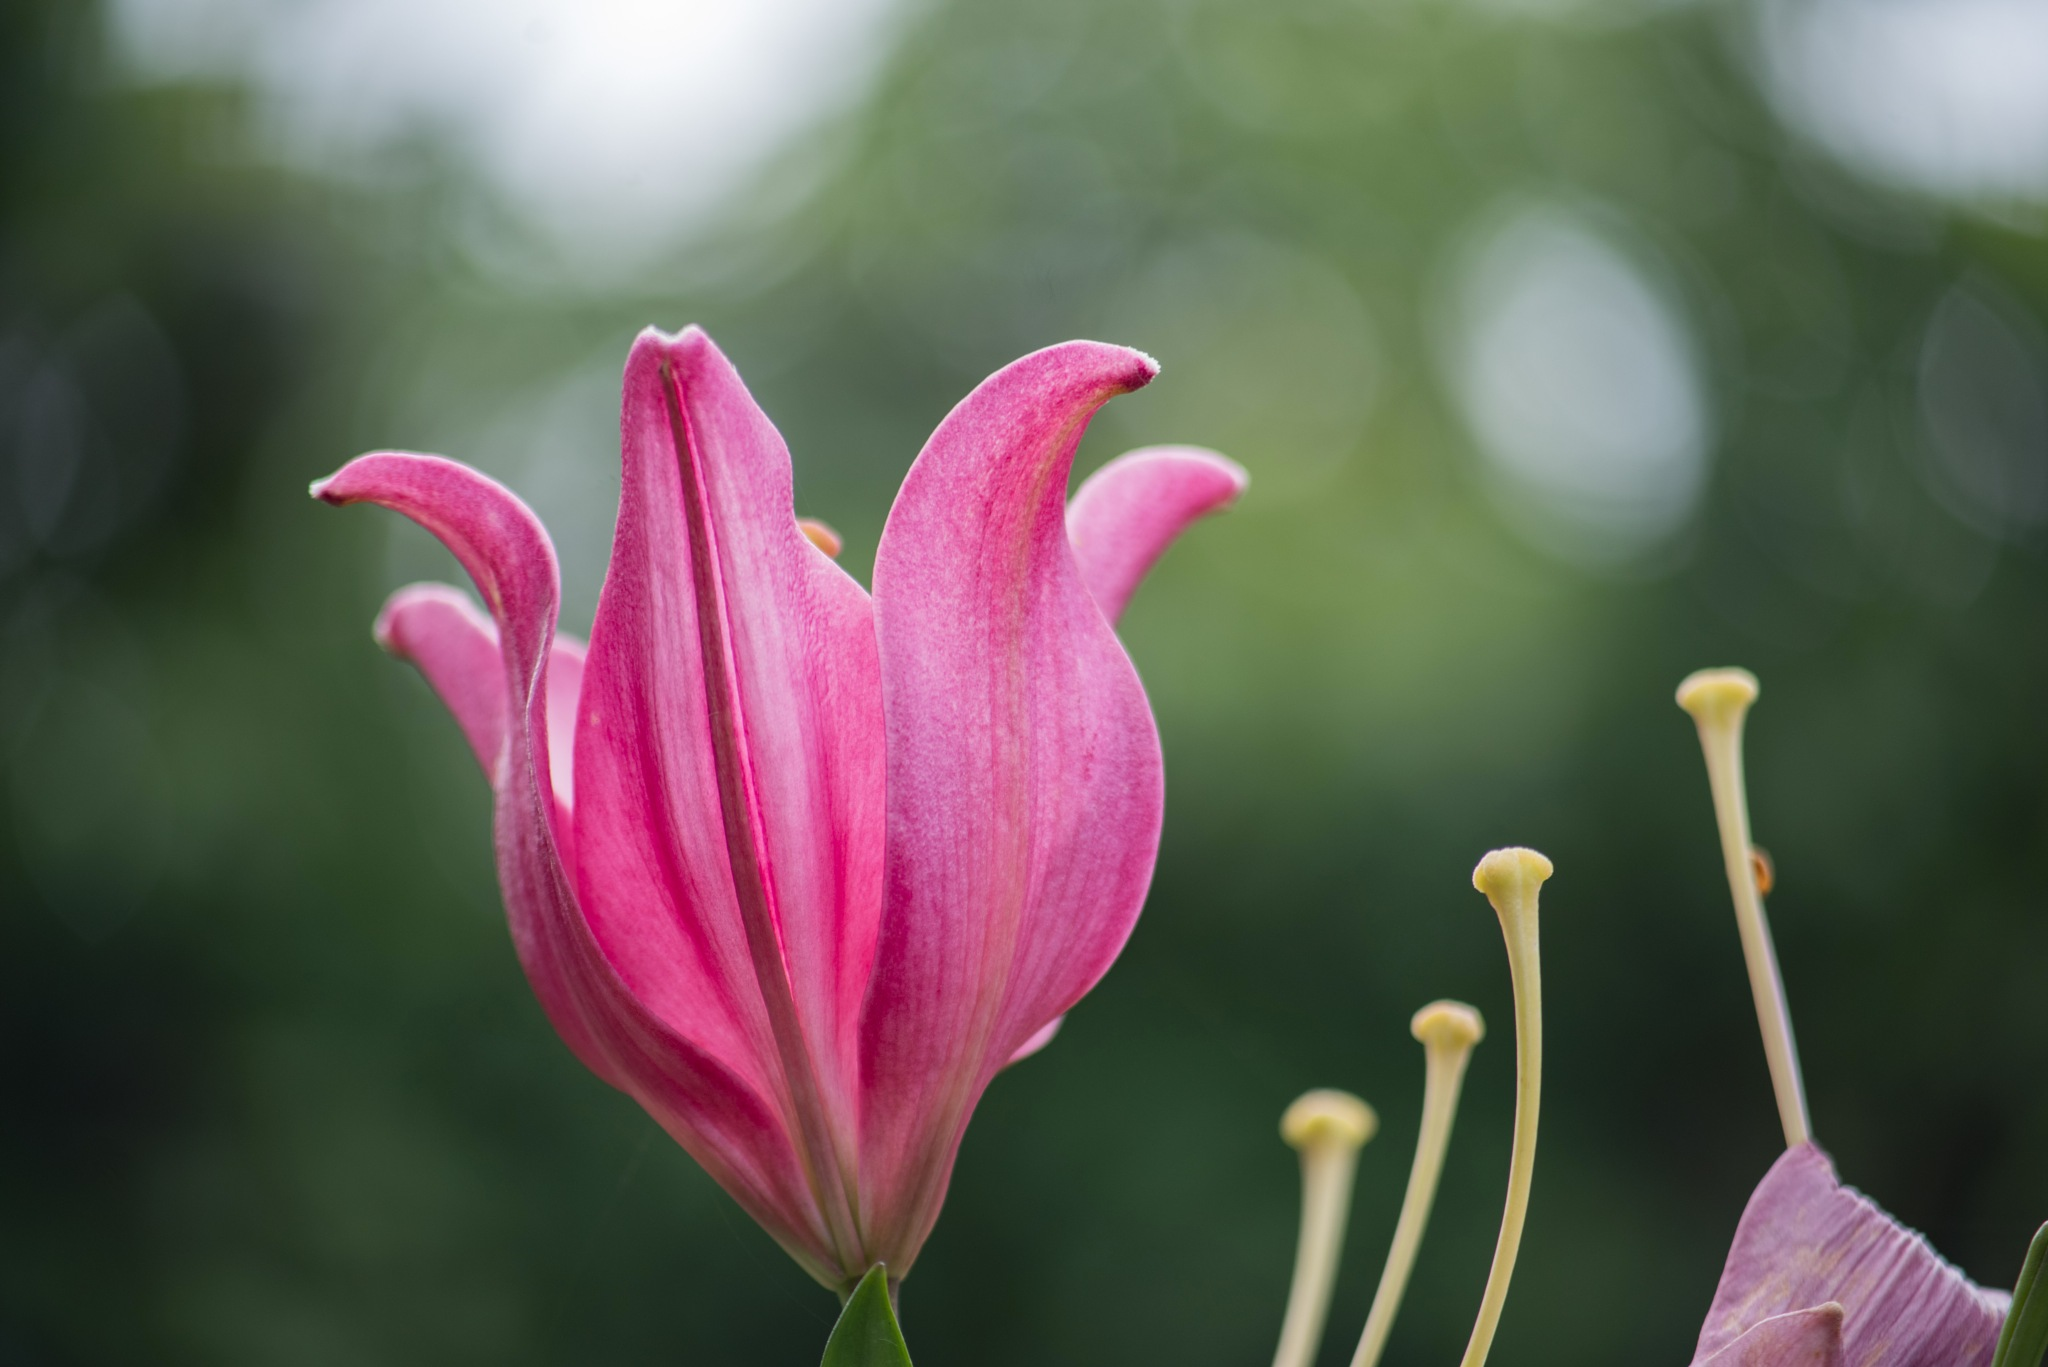 Flowers by Daniele Vecchi